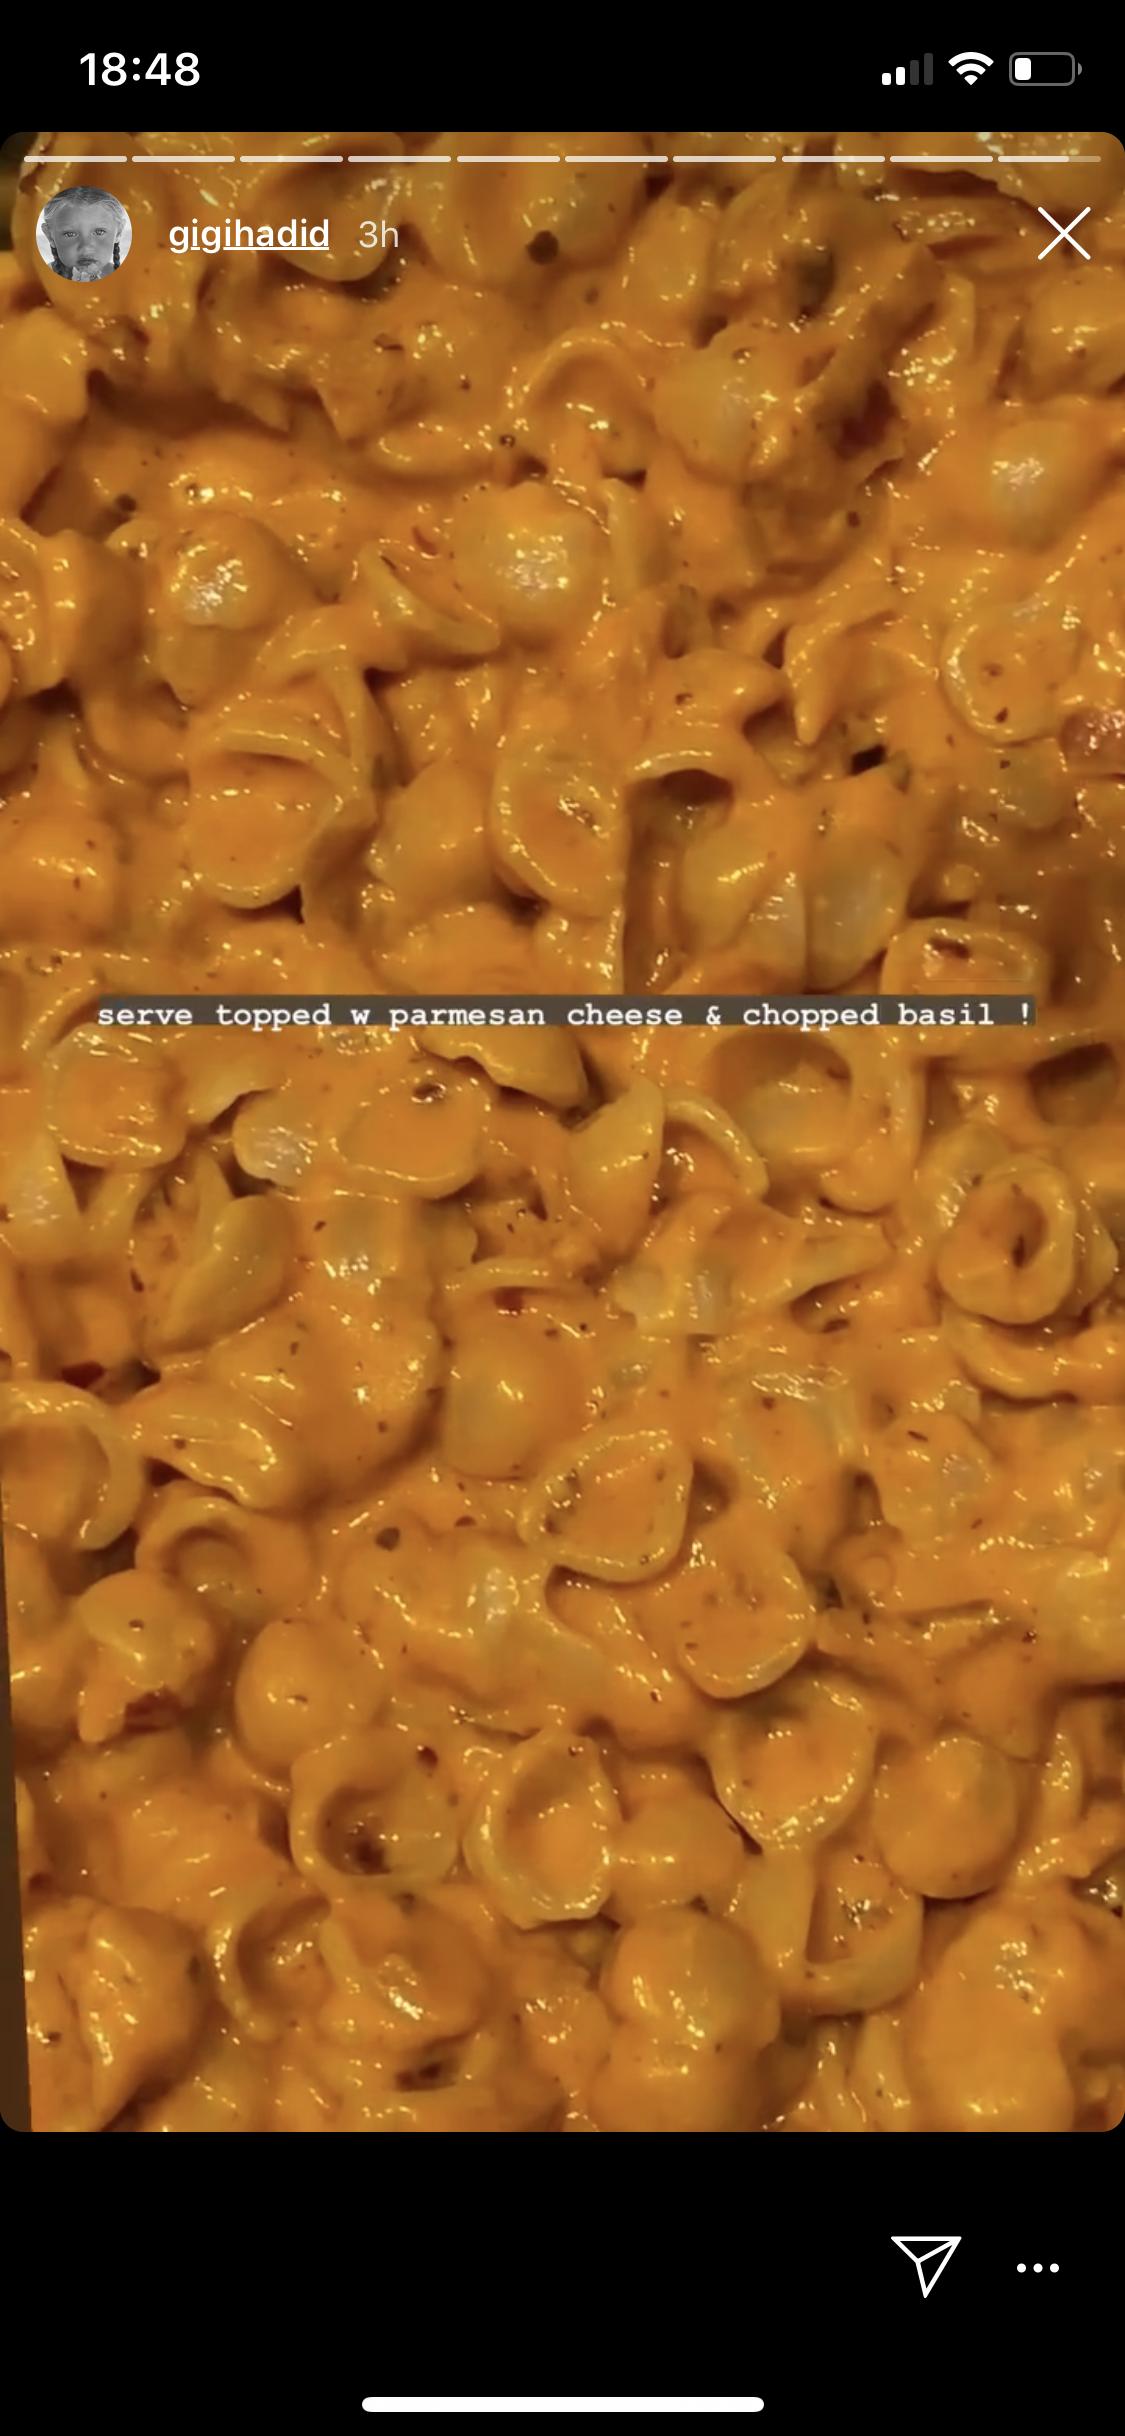 Gigi Hadid S Spicy Vodka Pasta Recipe In 2020 Yummy Pasta Recipes Pasta Recipes How To Cook Pasta